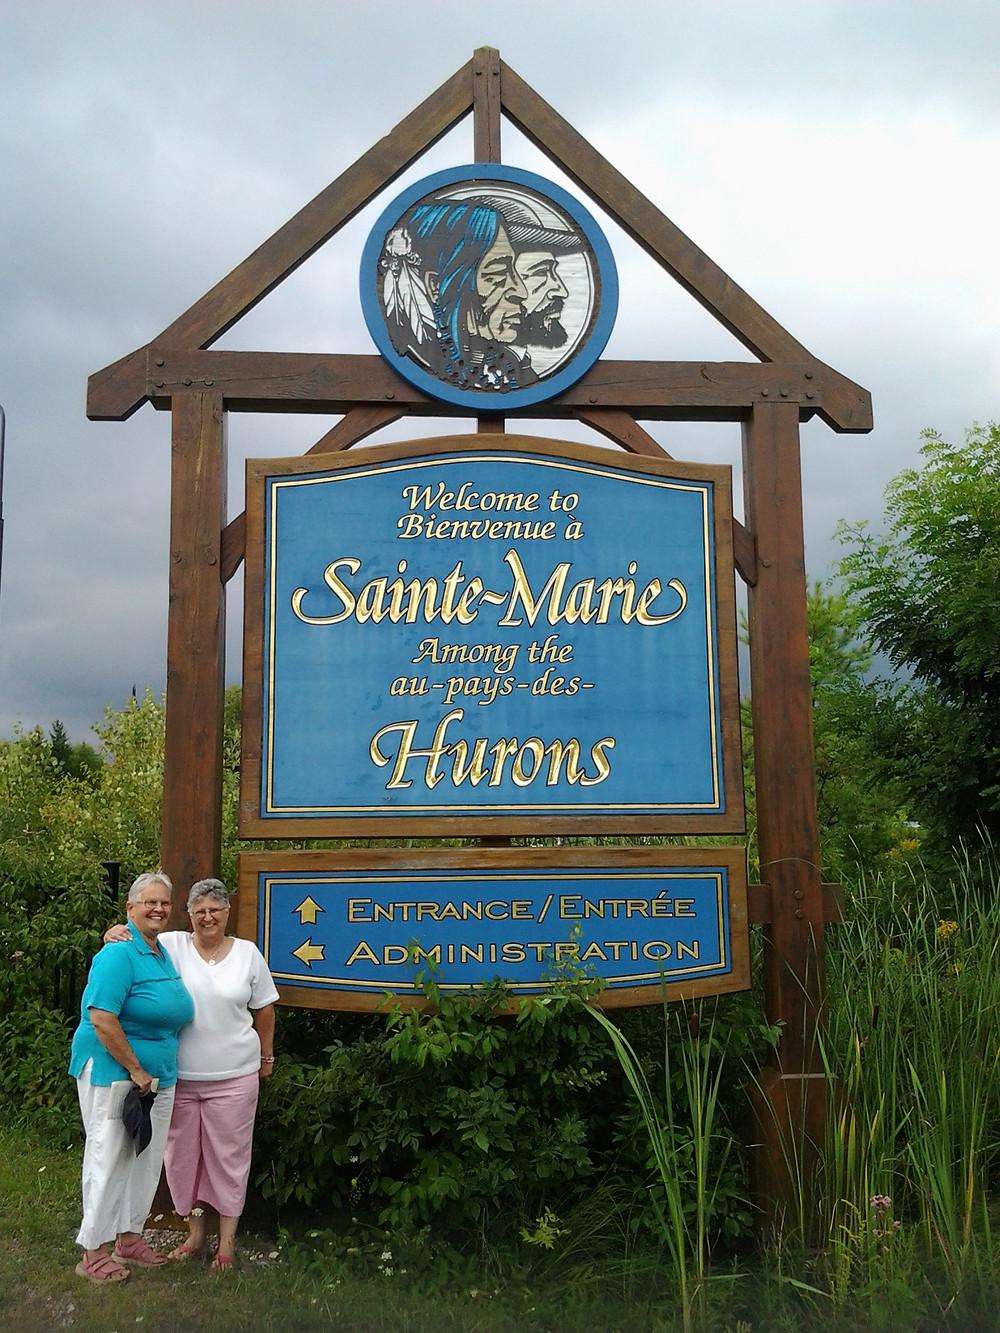 6 Sainte-Marie among the Hurons 122.jpg